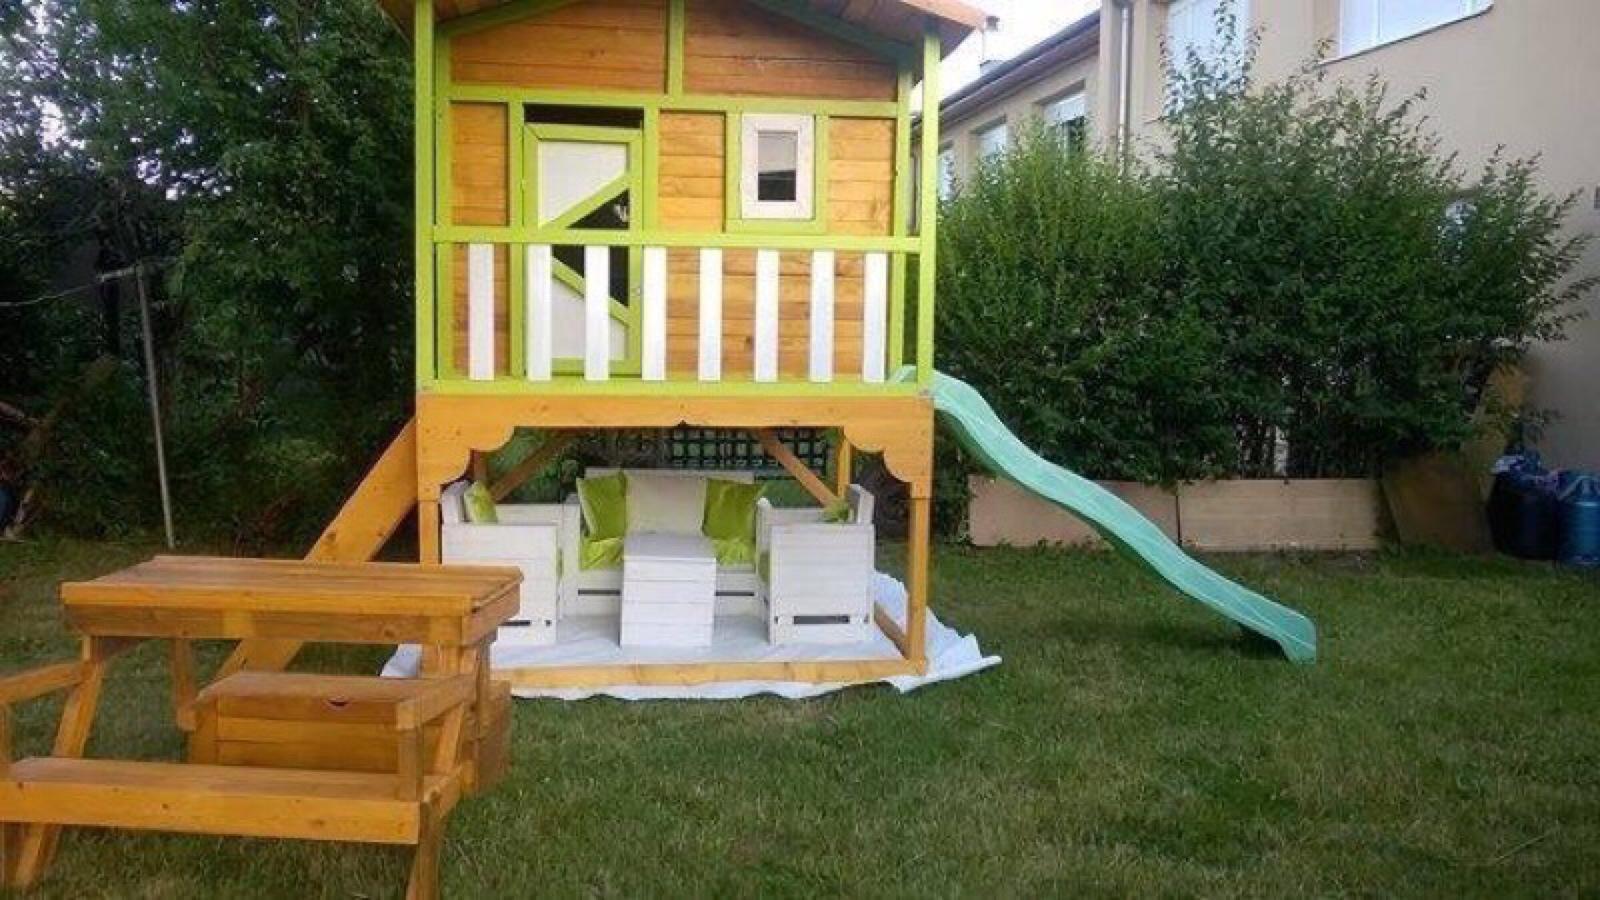 Piccola casetta da giardino per i bambiniMobili con Pallet